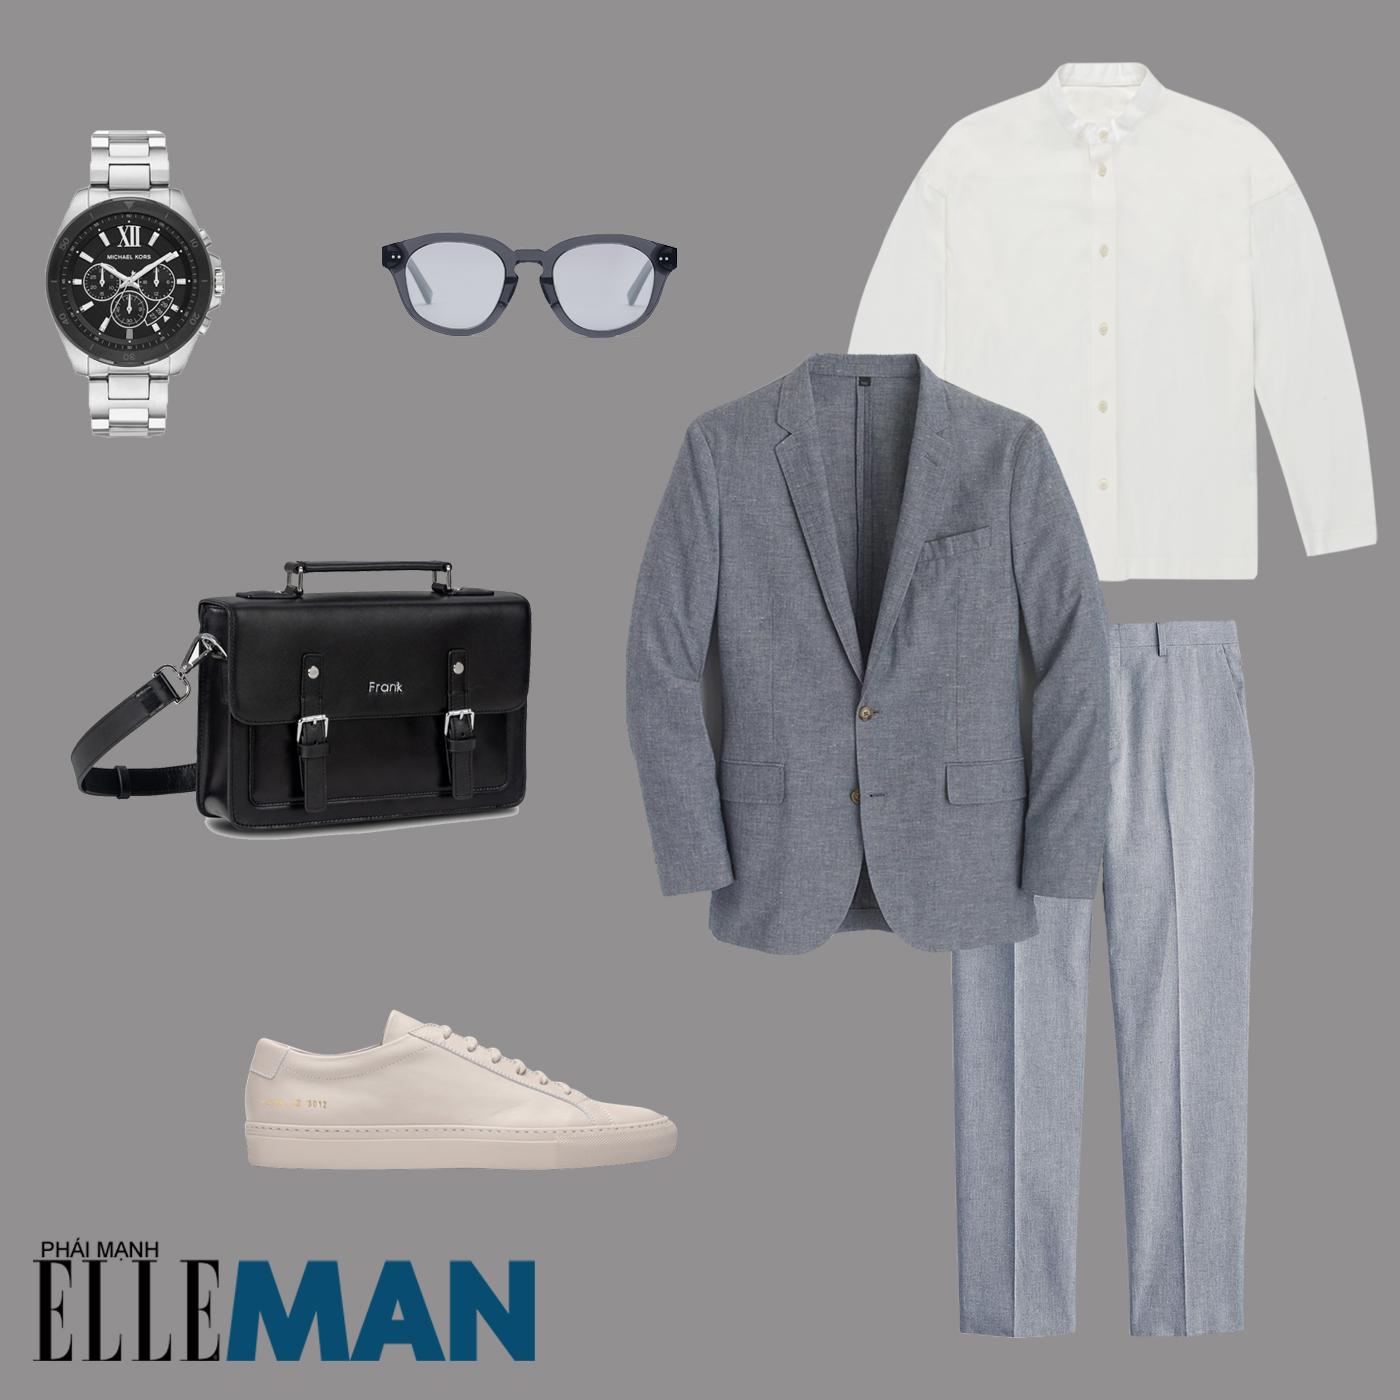 trang phuc linen - elle man style calendar - layout outfit 4